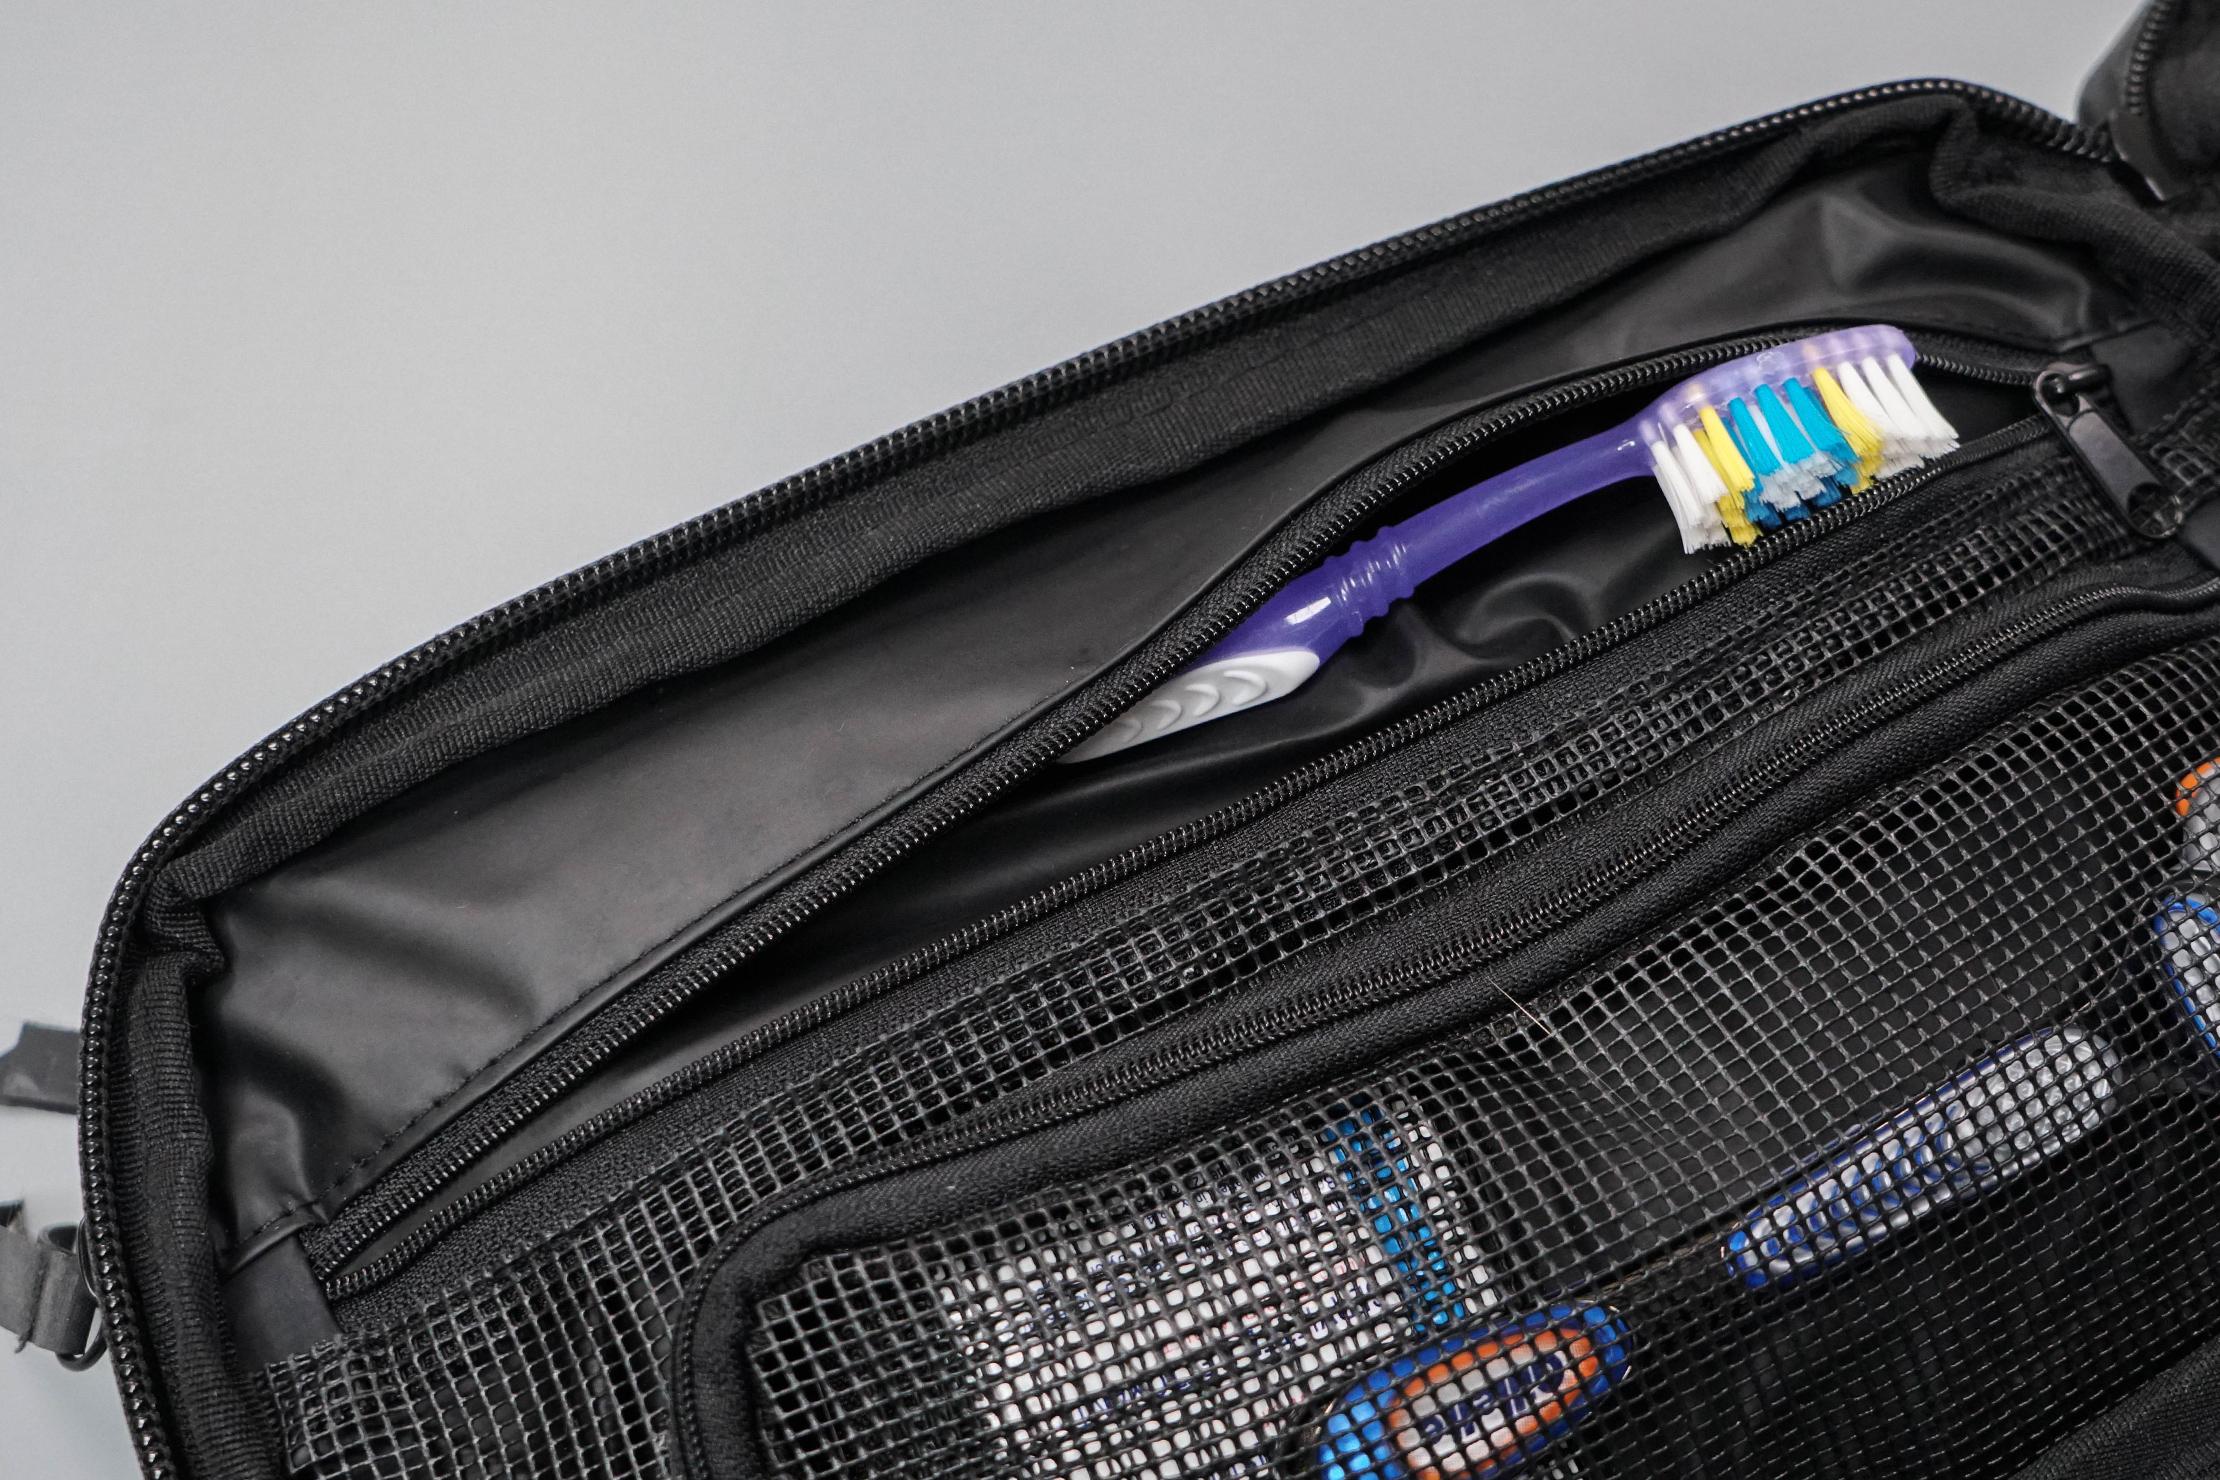 Gravel Explorer Plus Toiletry Bag Toothbrush